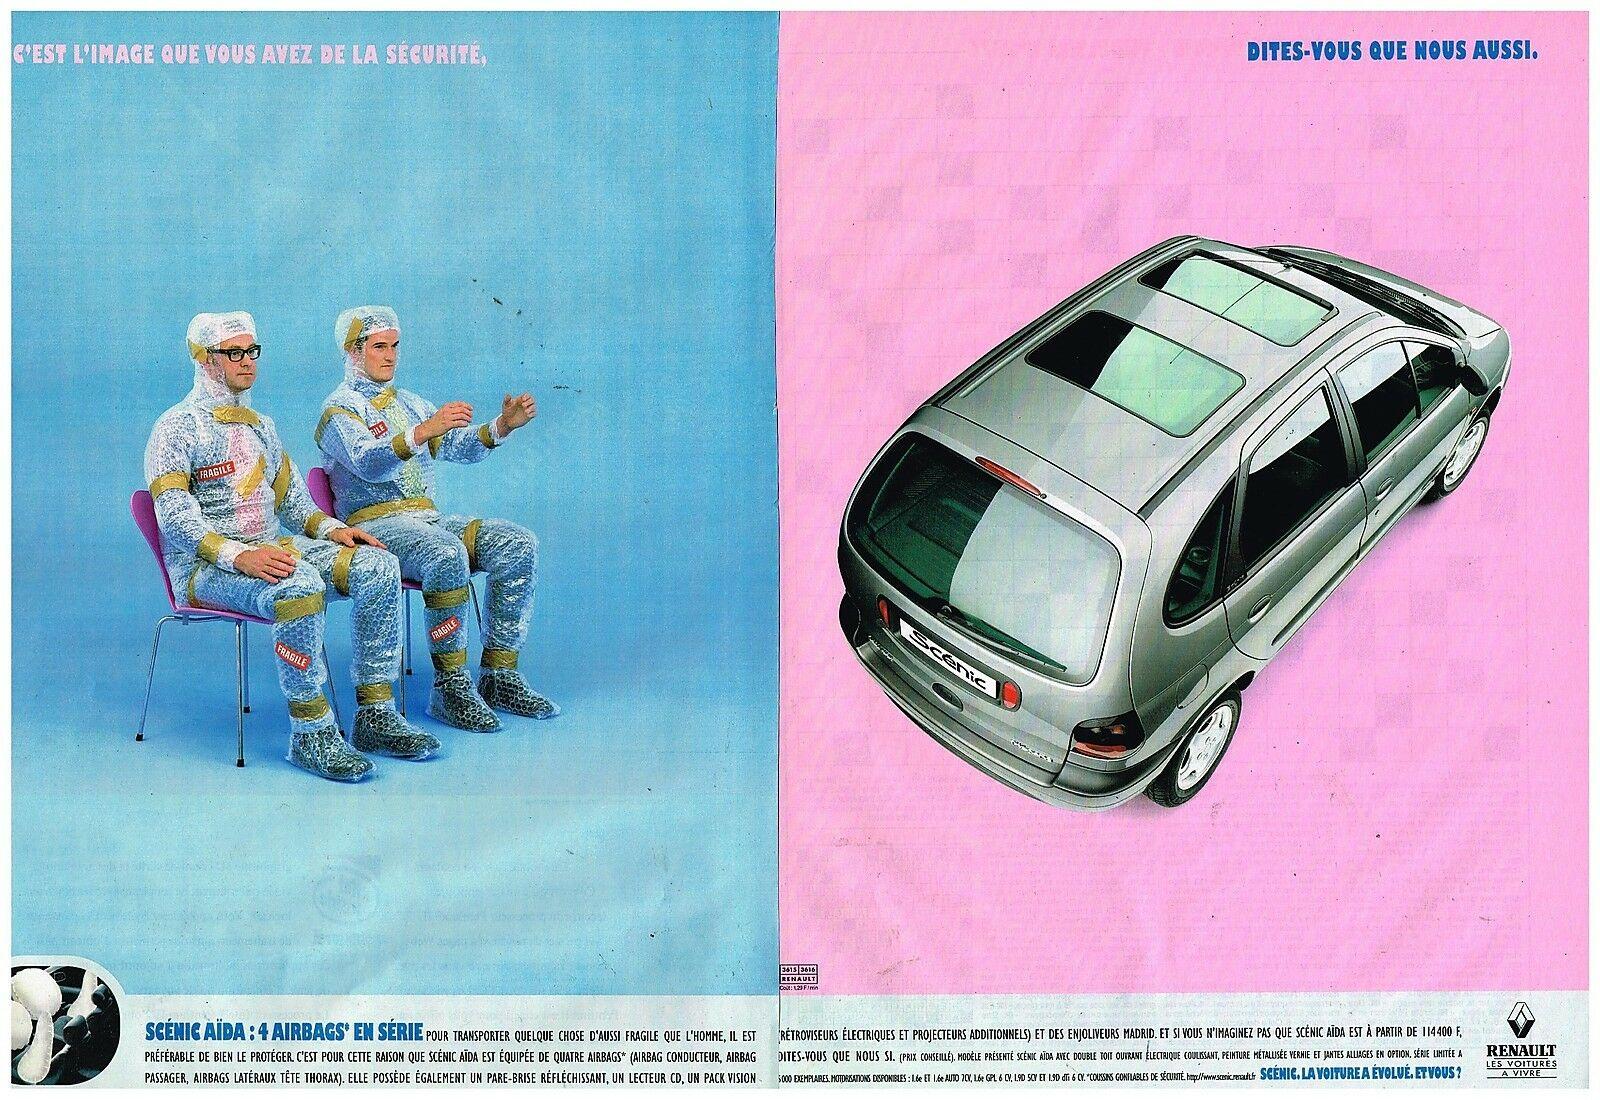 1998 Renault Scenic Aida